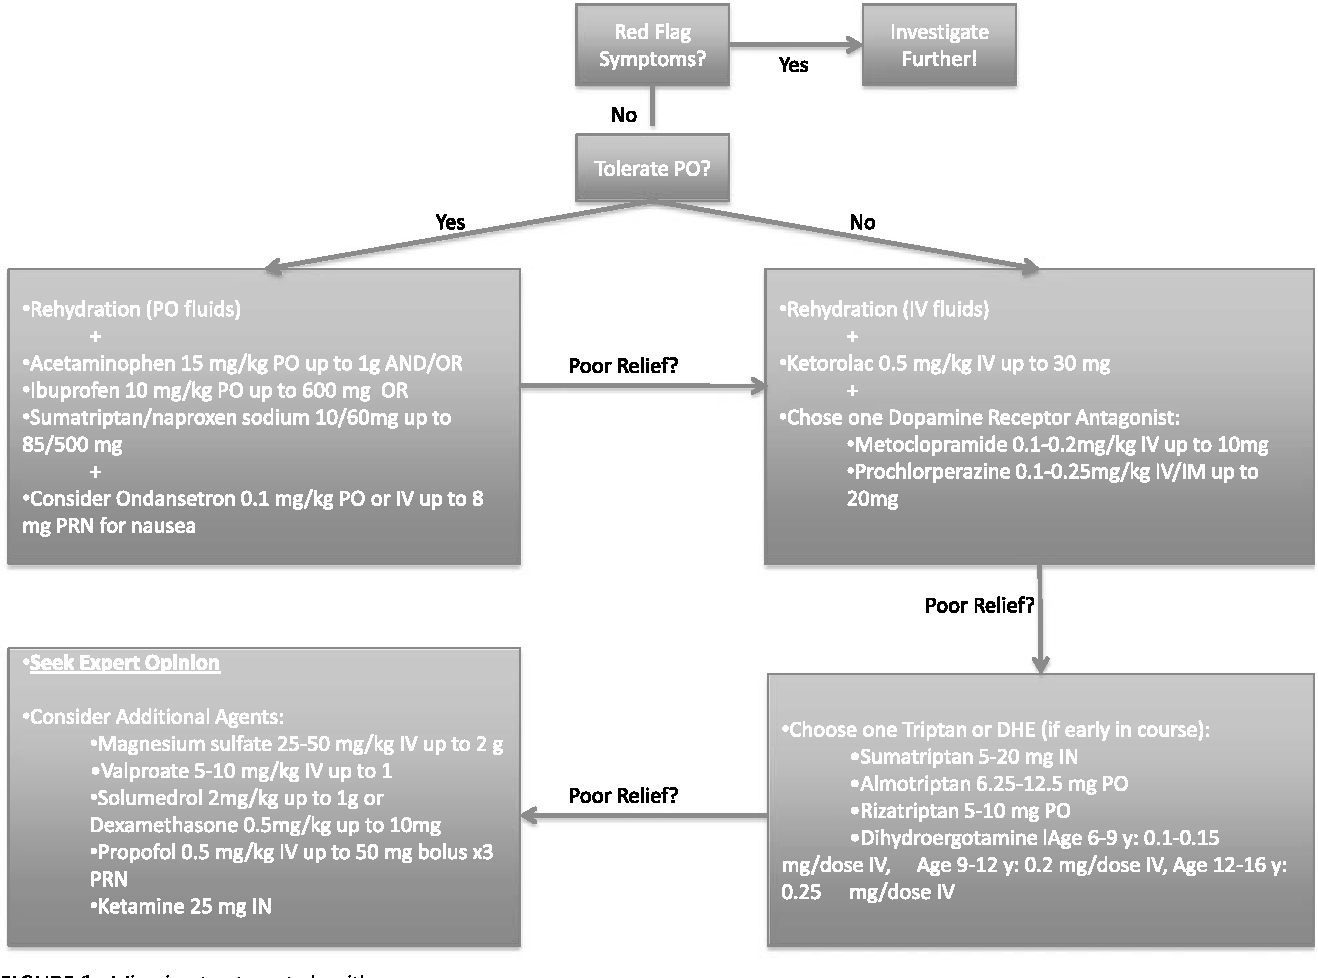 FIGURE 1. Migraine treatment algorithm.